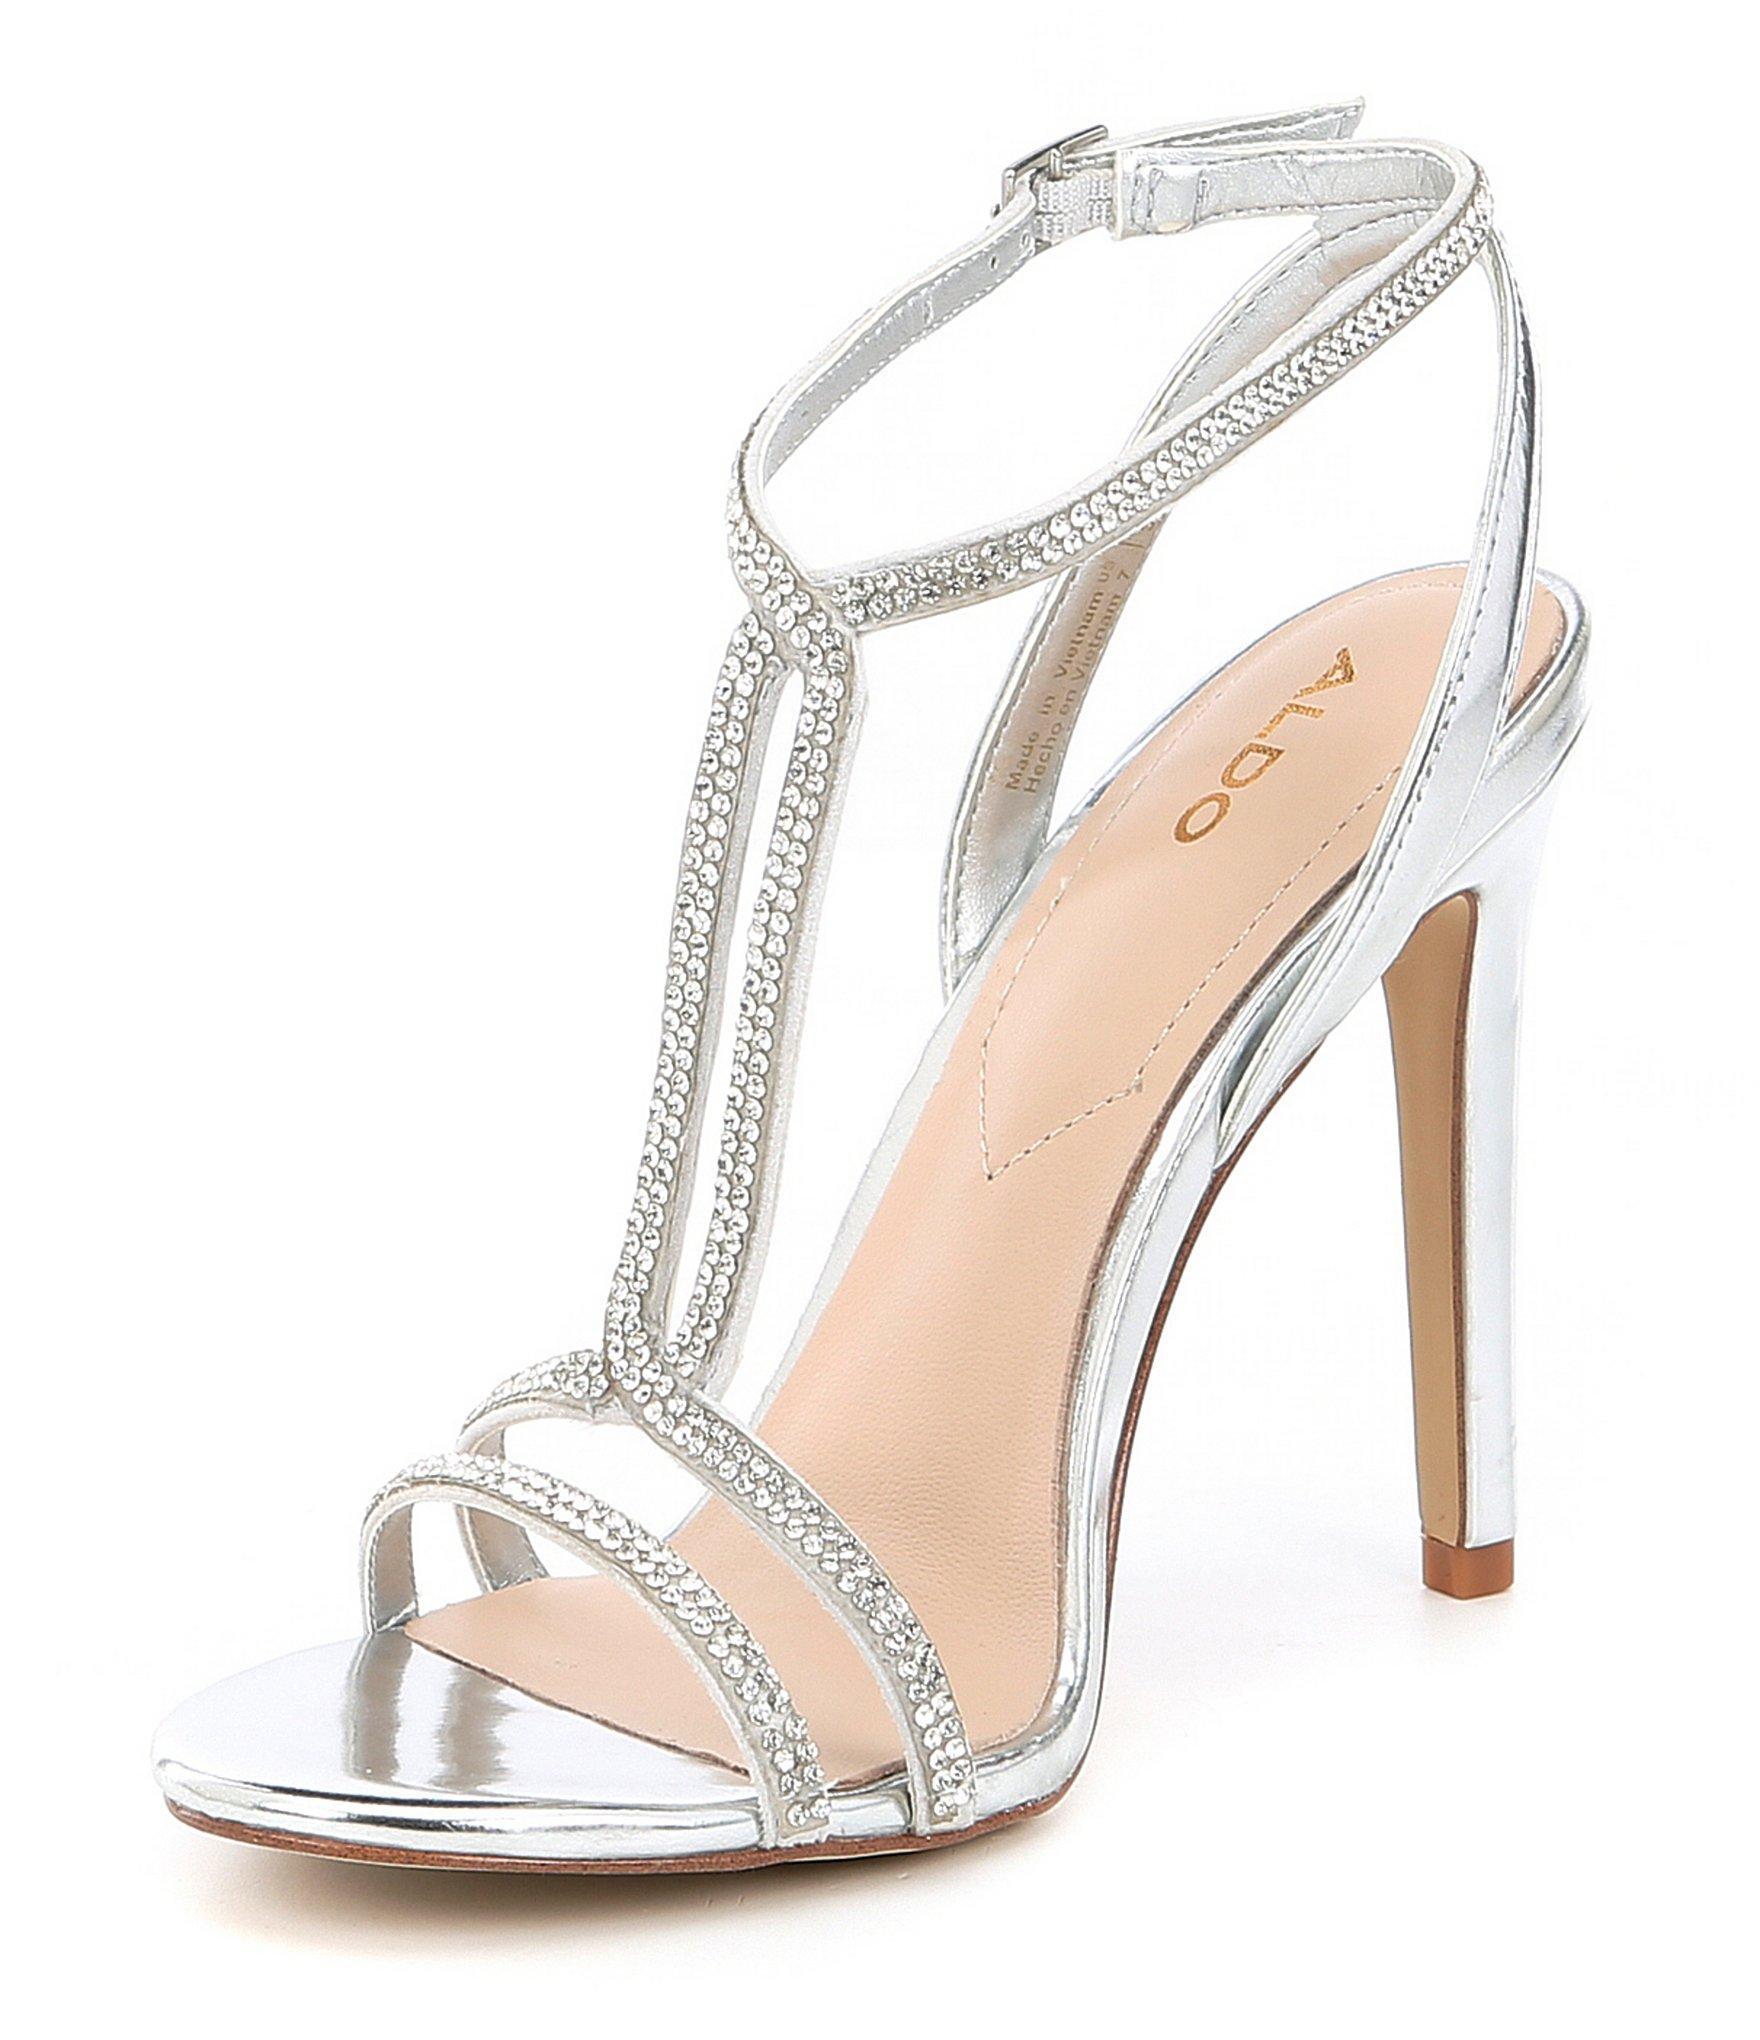 b0868c82794 ALDO Dovyan Embellished Heeled Sandals In Silver in Metallic - Lyst